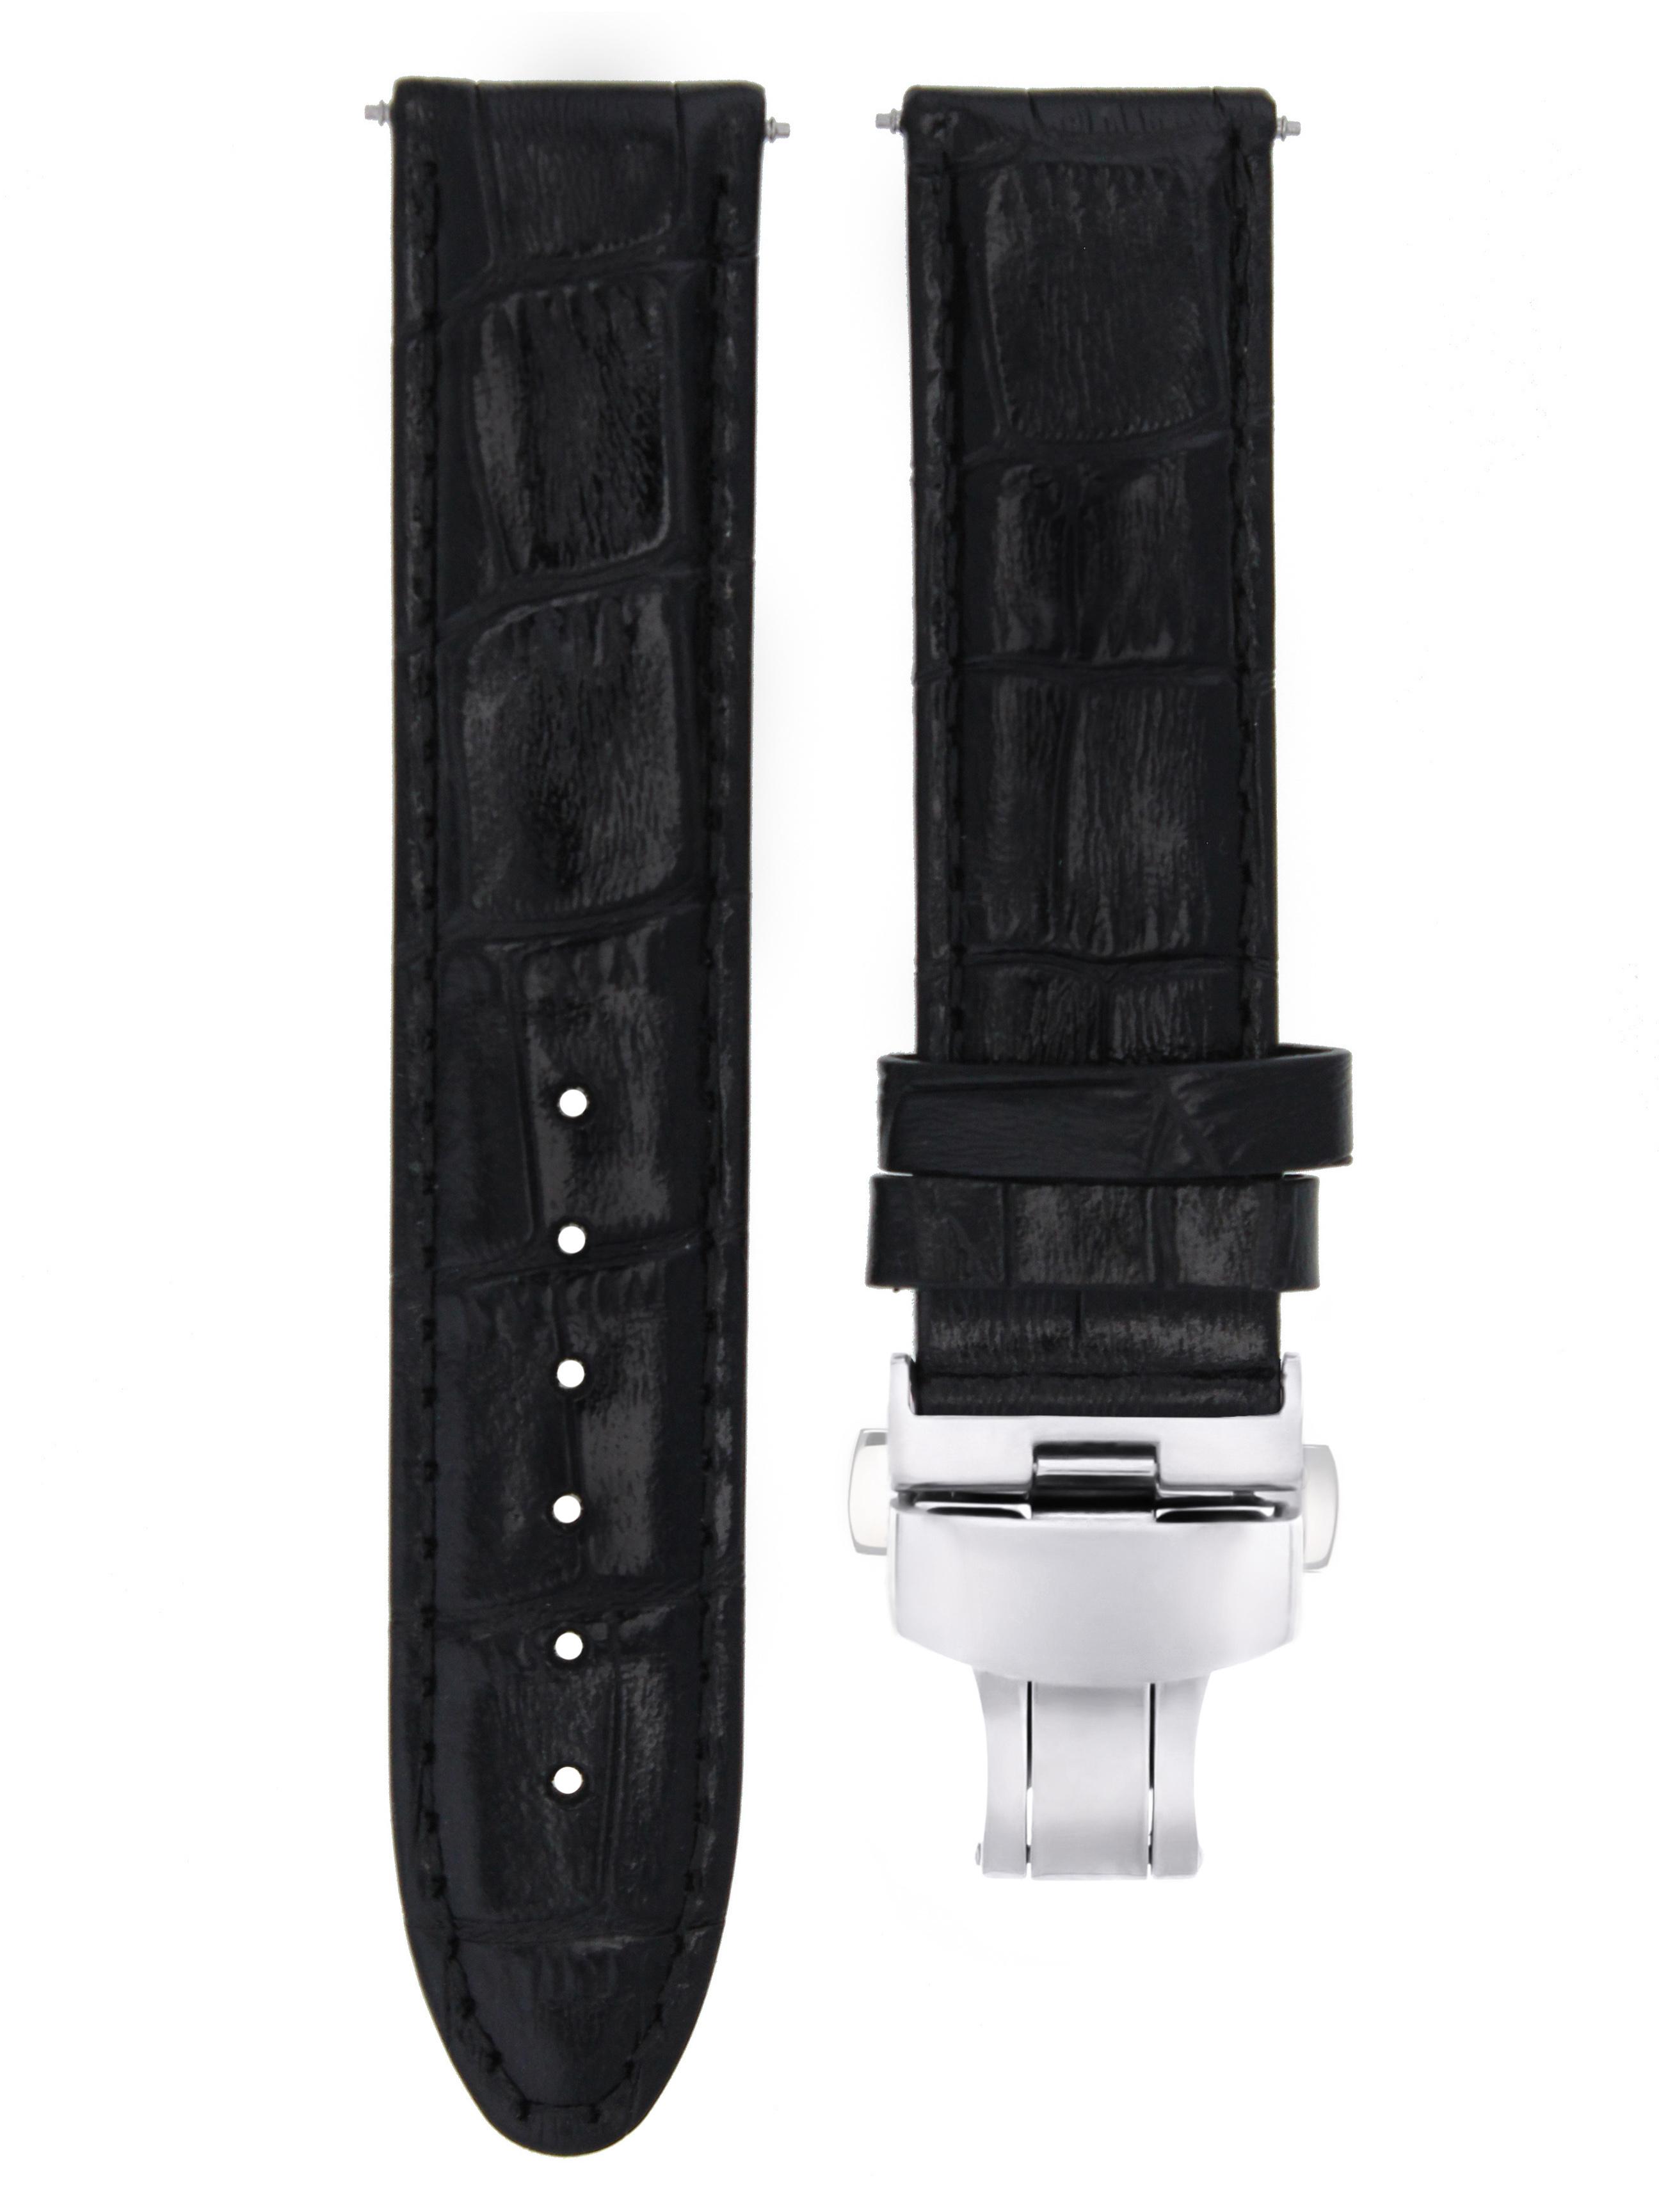 20MM PREMIUM LEATHER WATCH STRAP BAND FOR 36MM ROLEX DATEJUST SUBMARINER BLACK